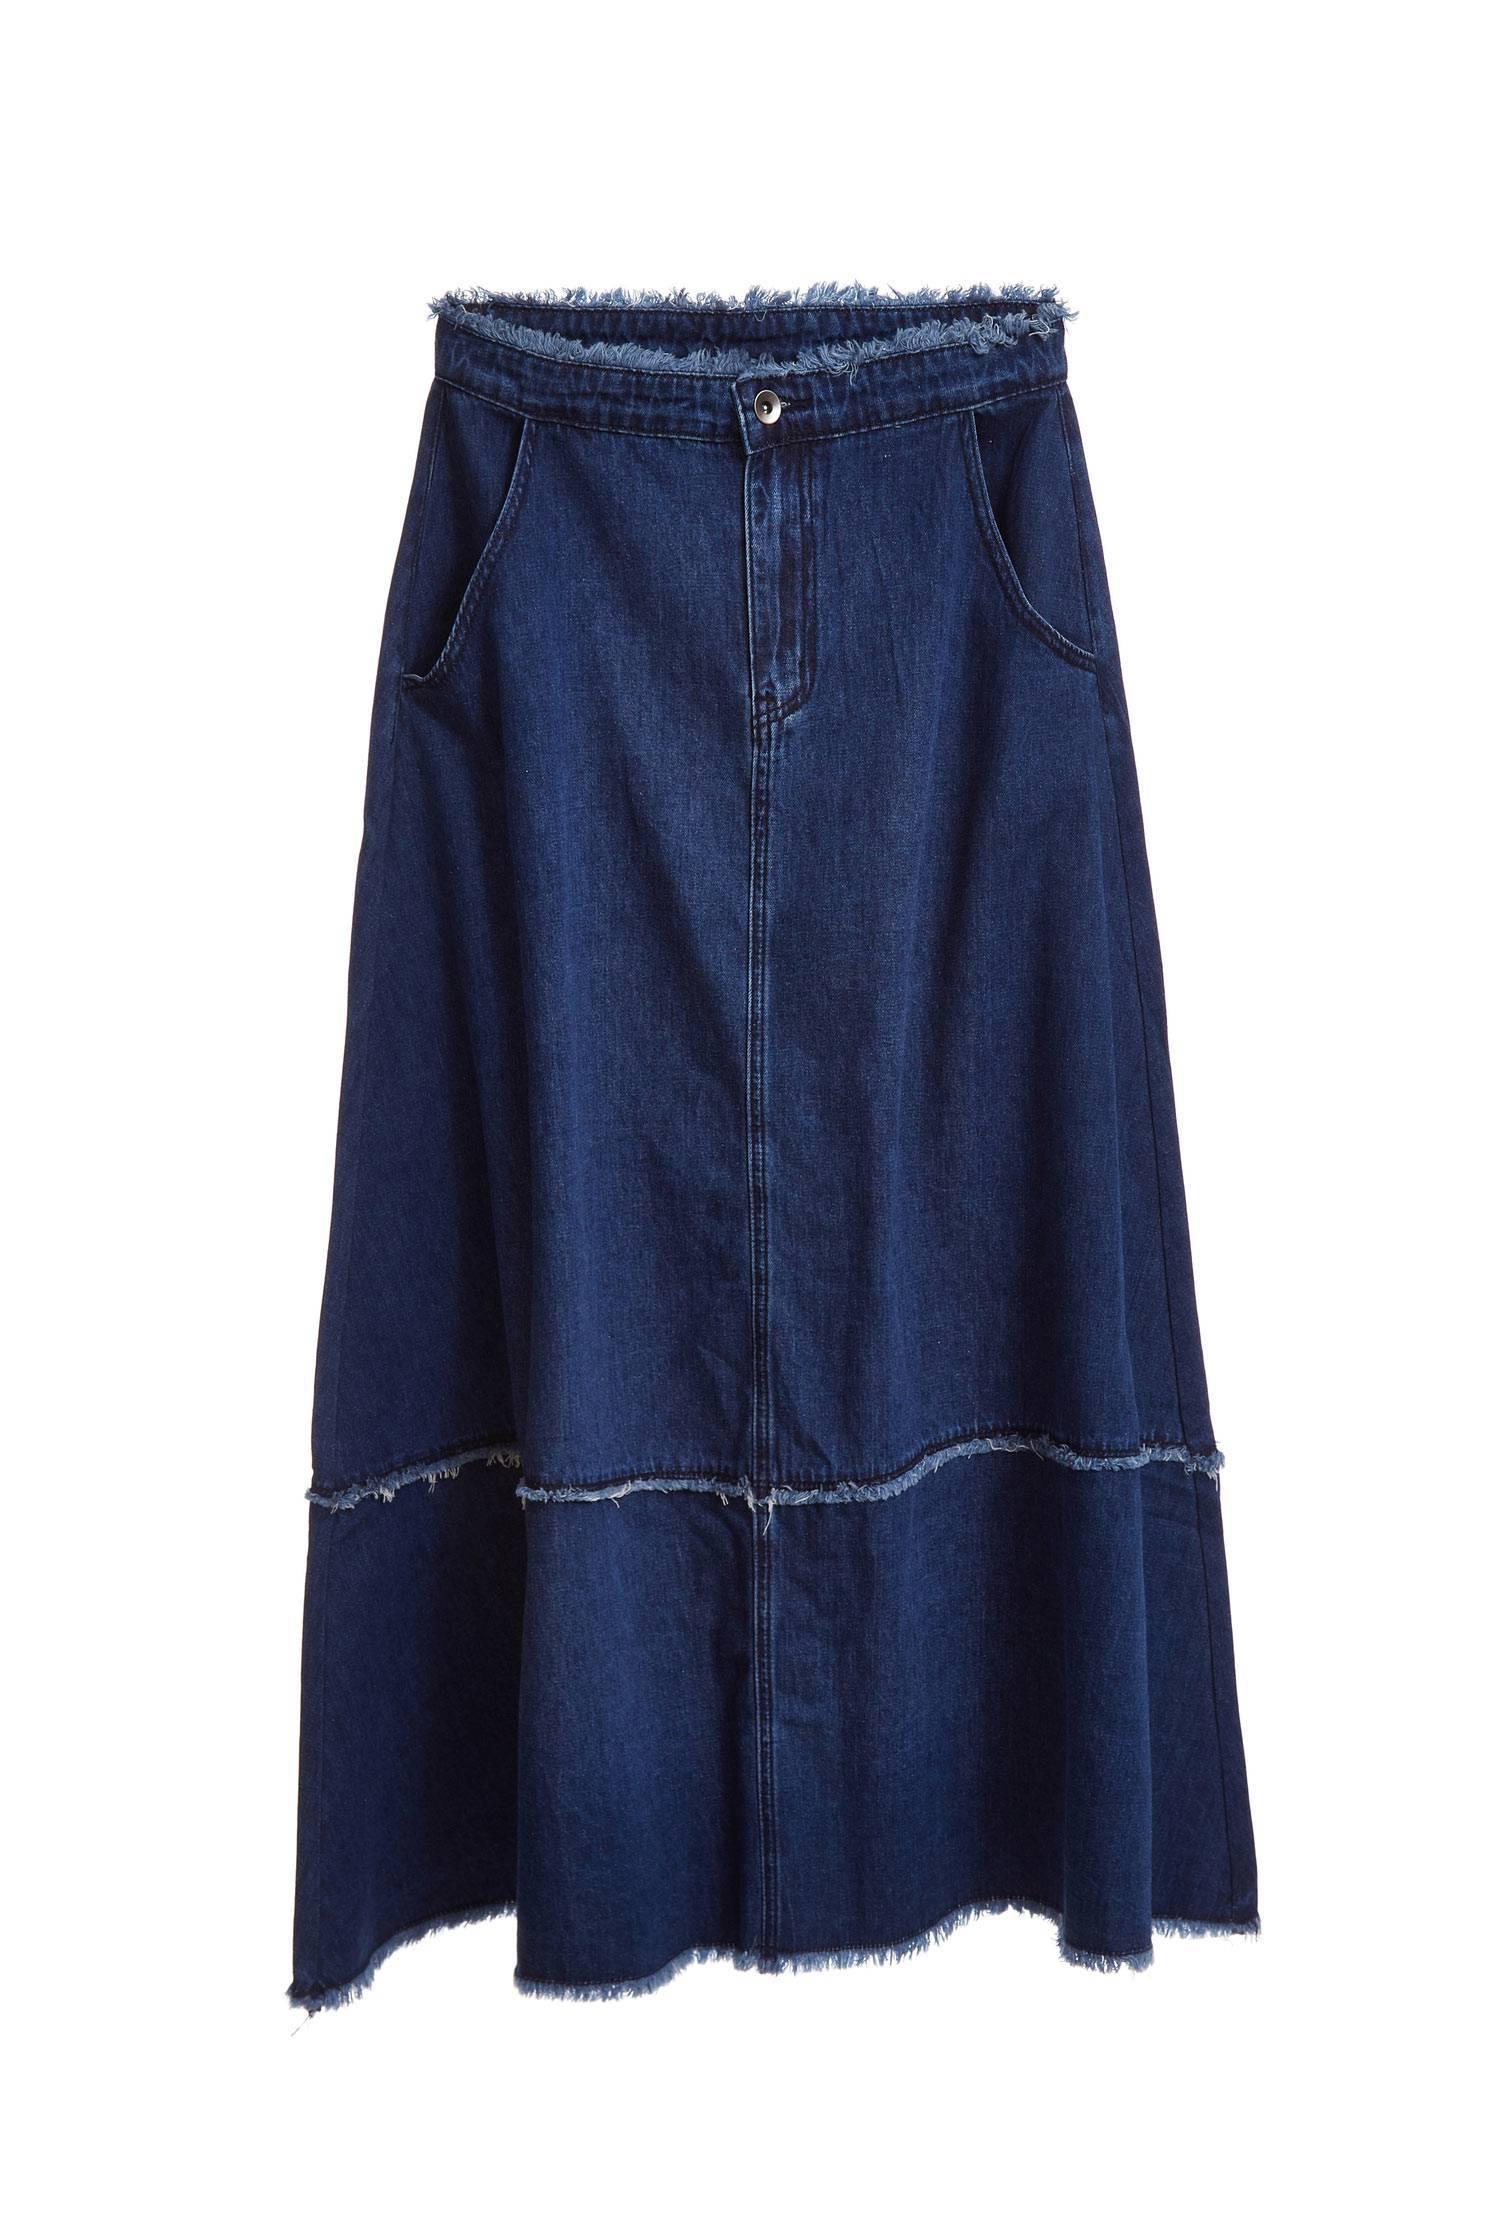 Stitching popular denim skirt